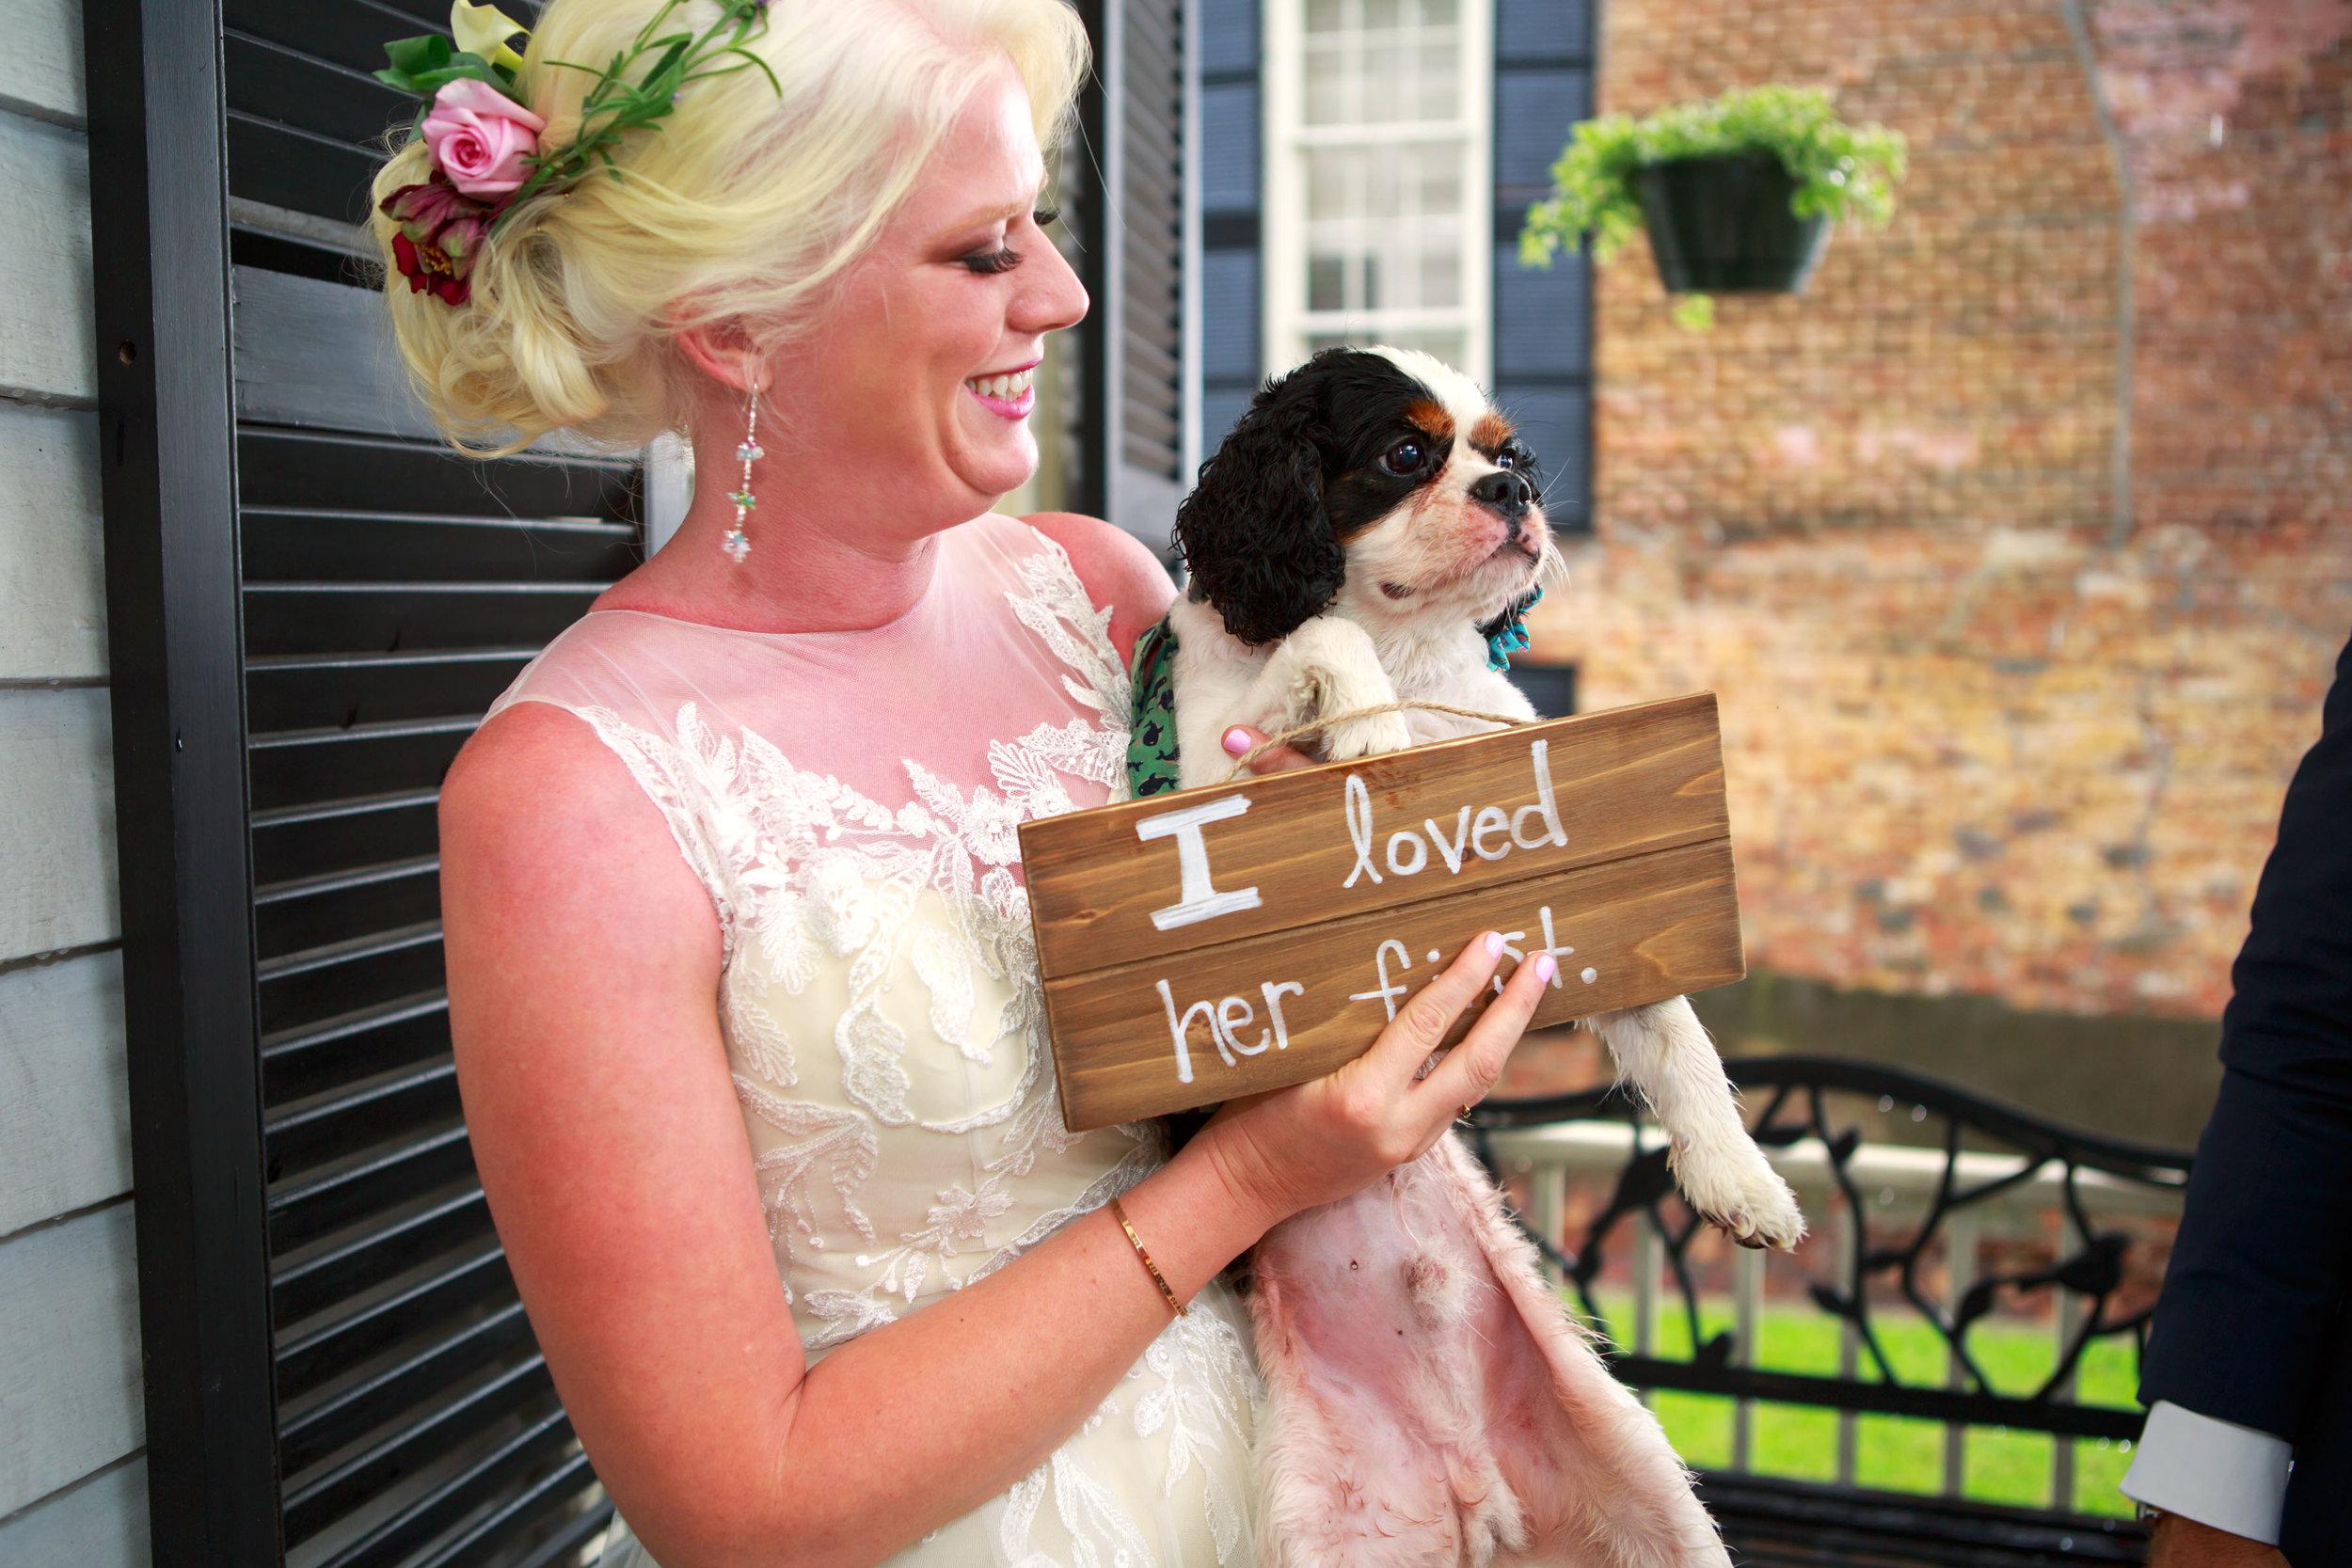 128-South-Wedding-Tiffany-Abruzzo-Photography-First-Look-21.jpg